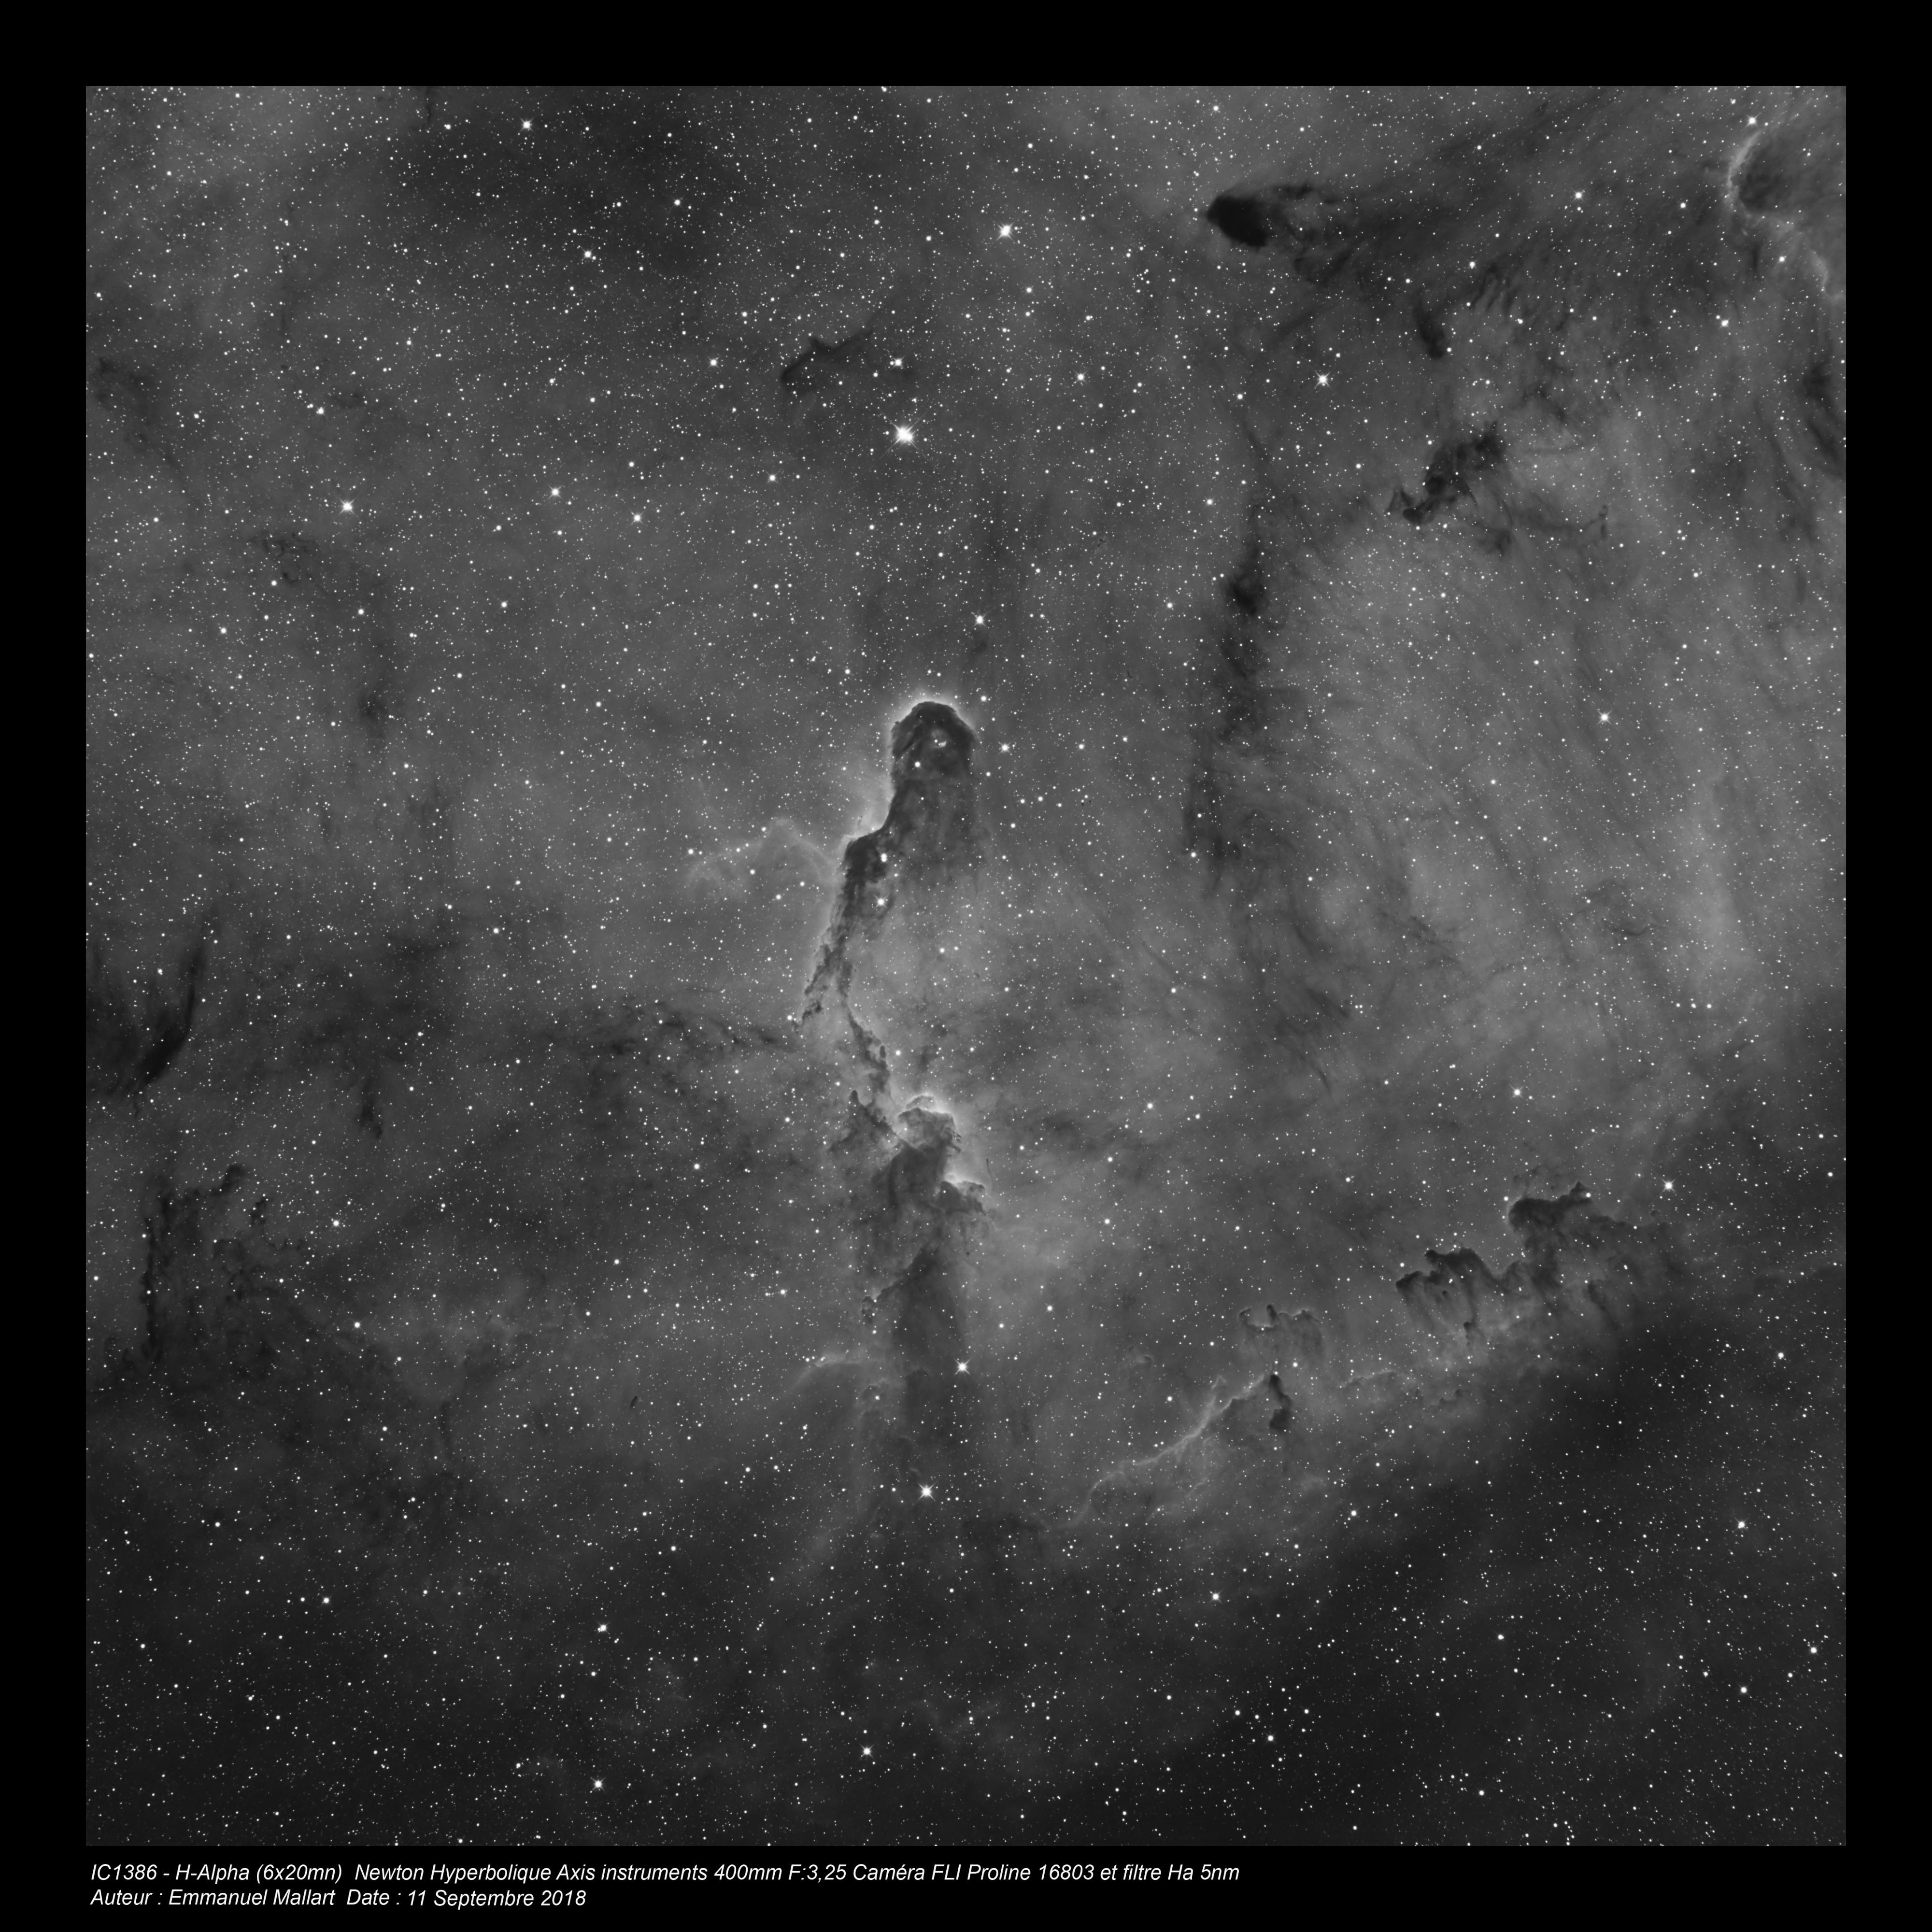 IC1396 en Halpha - Newton hyperbolique de 400mm